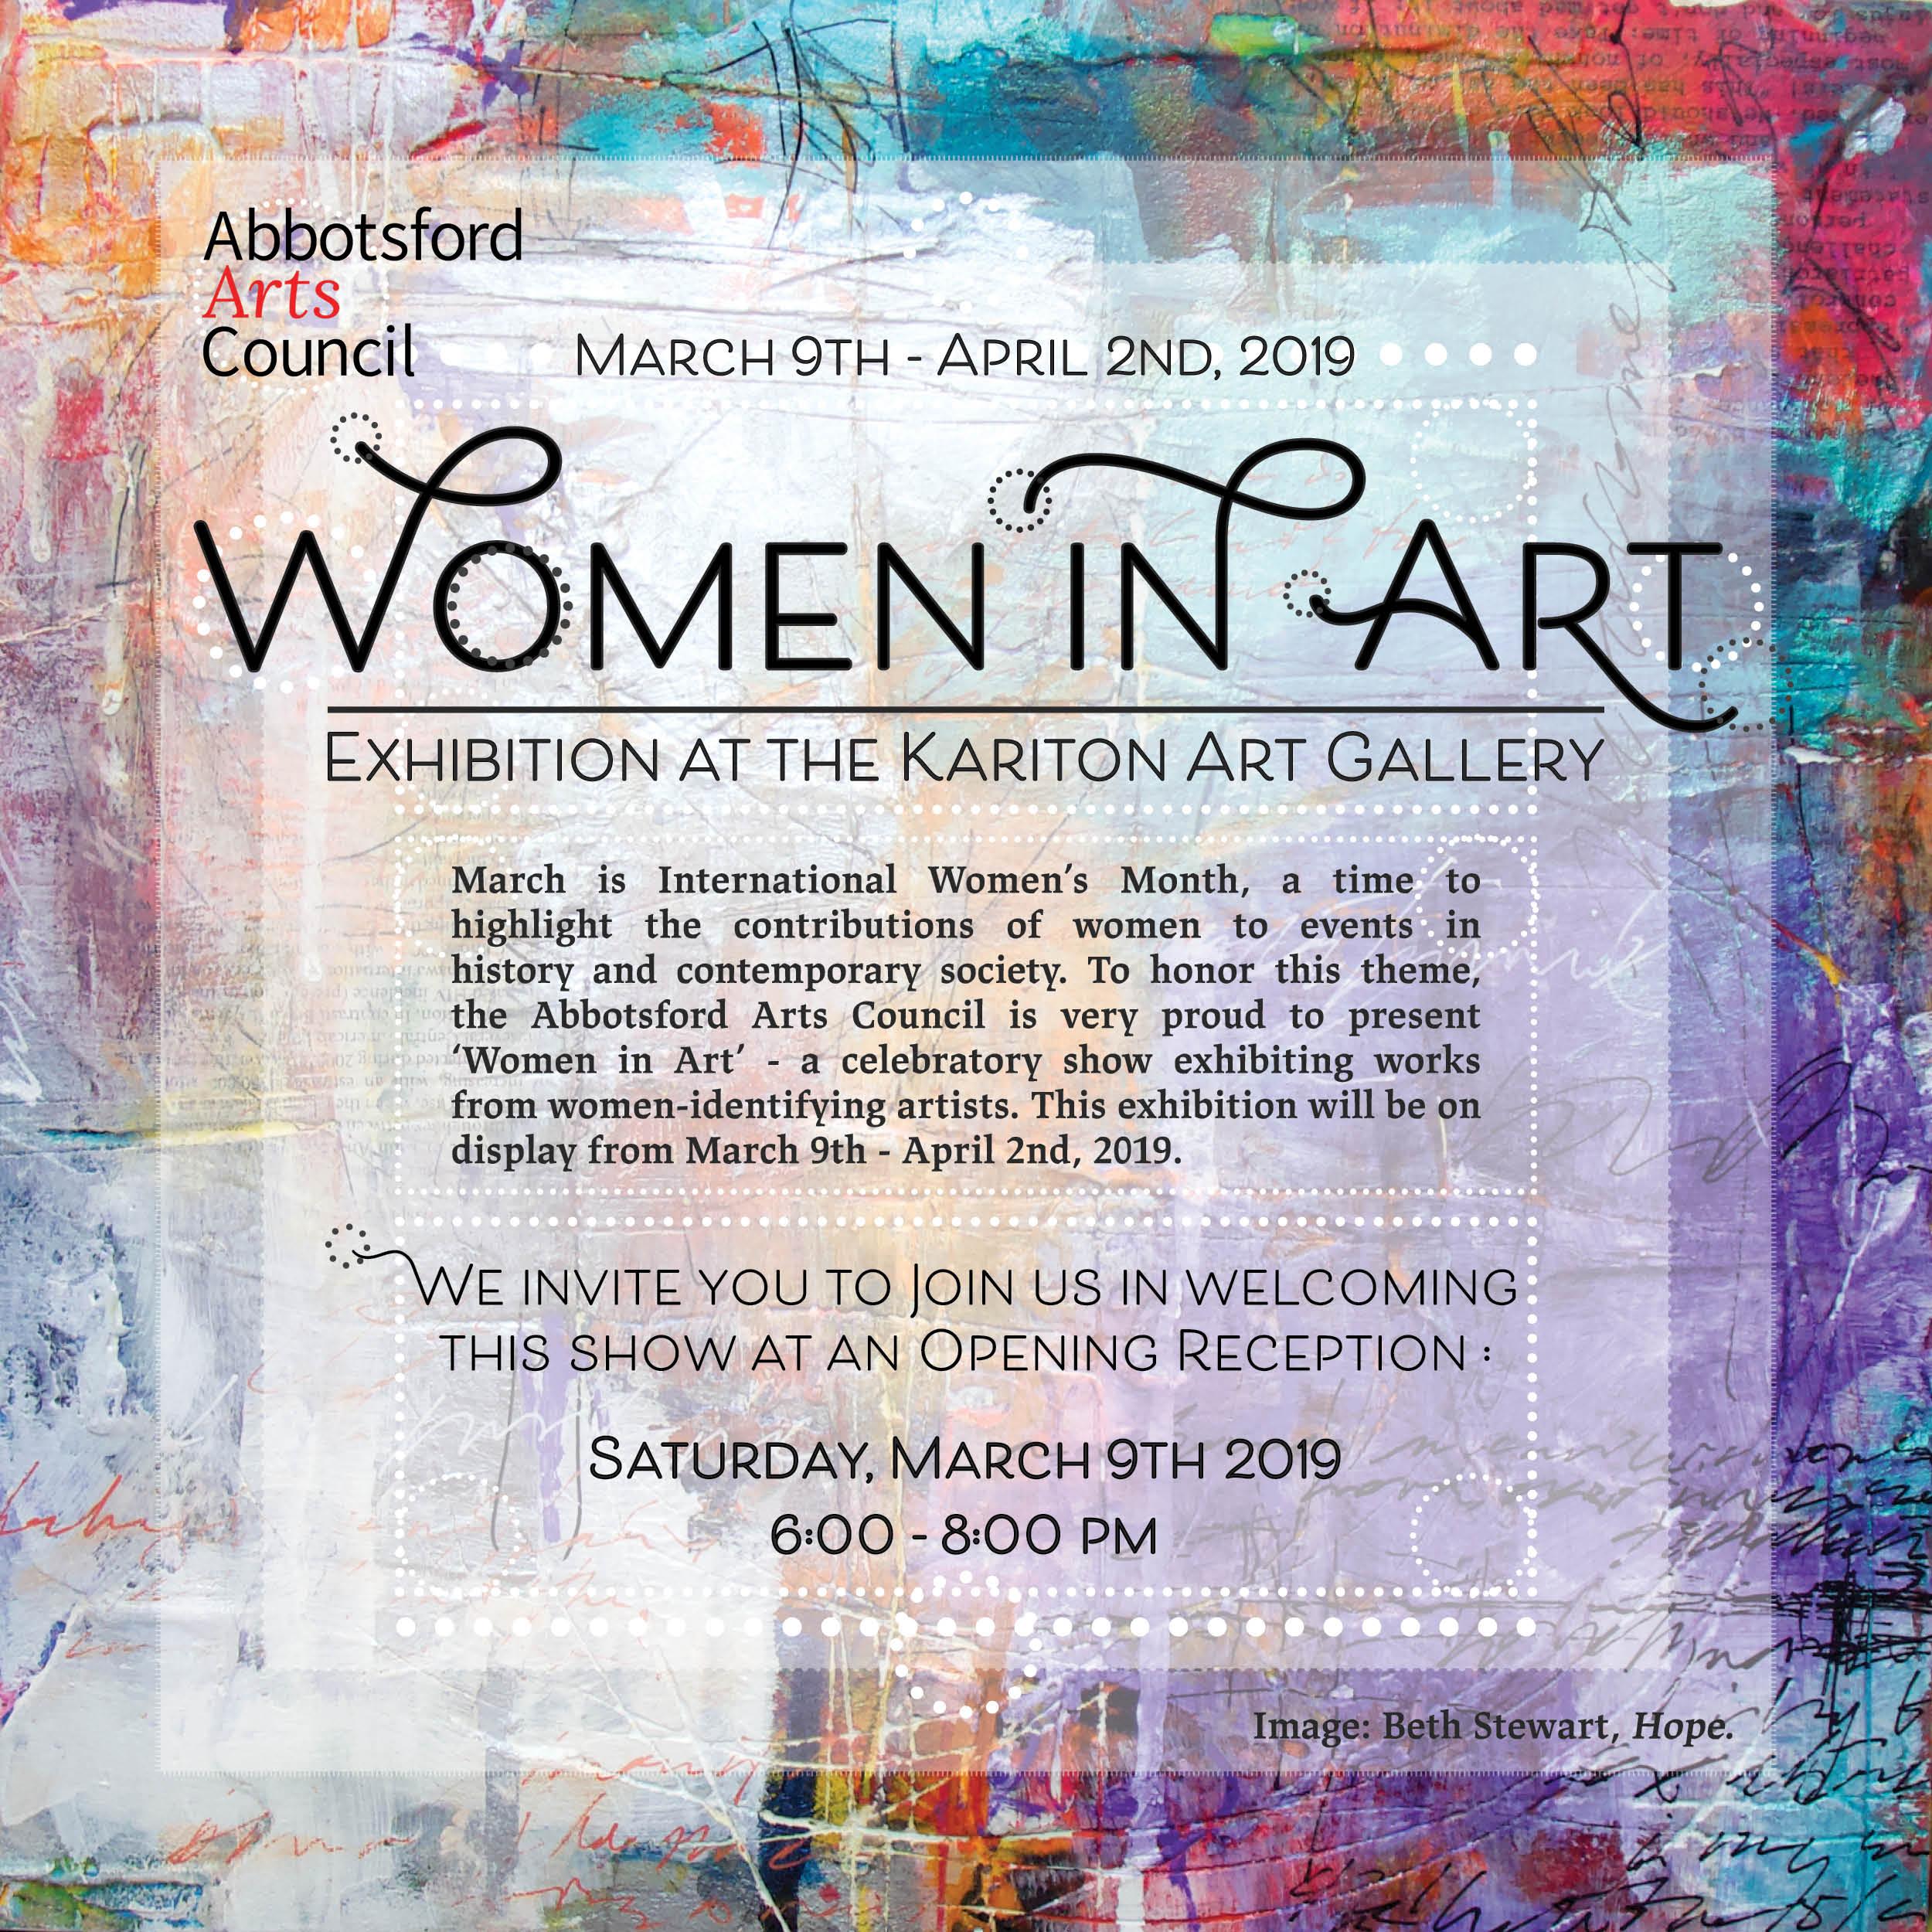 WomenInArt_Email-Invite.jpg